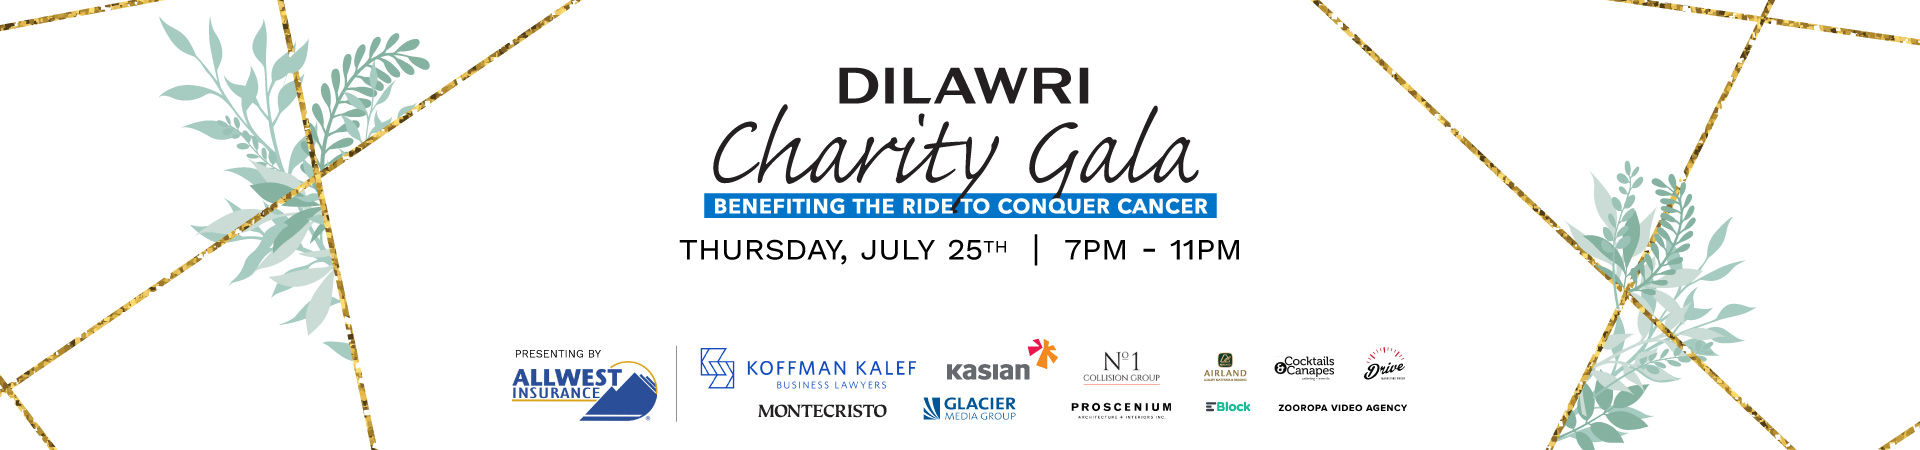 Dilawri Charity Gala